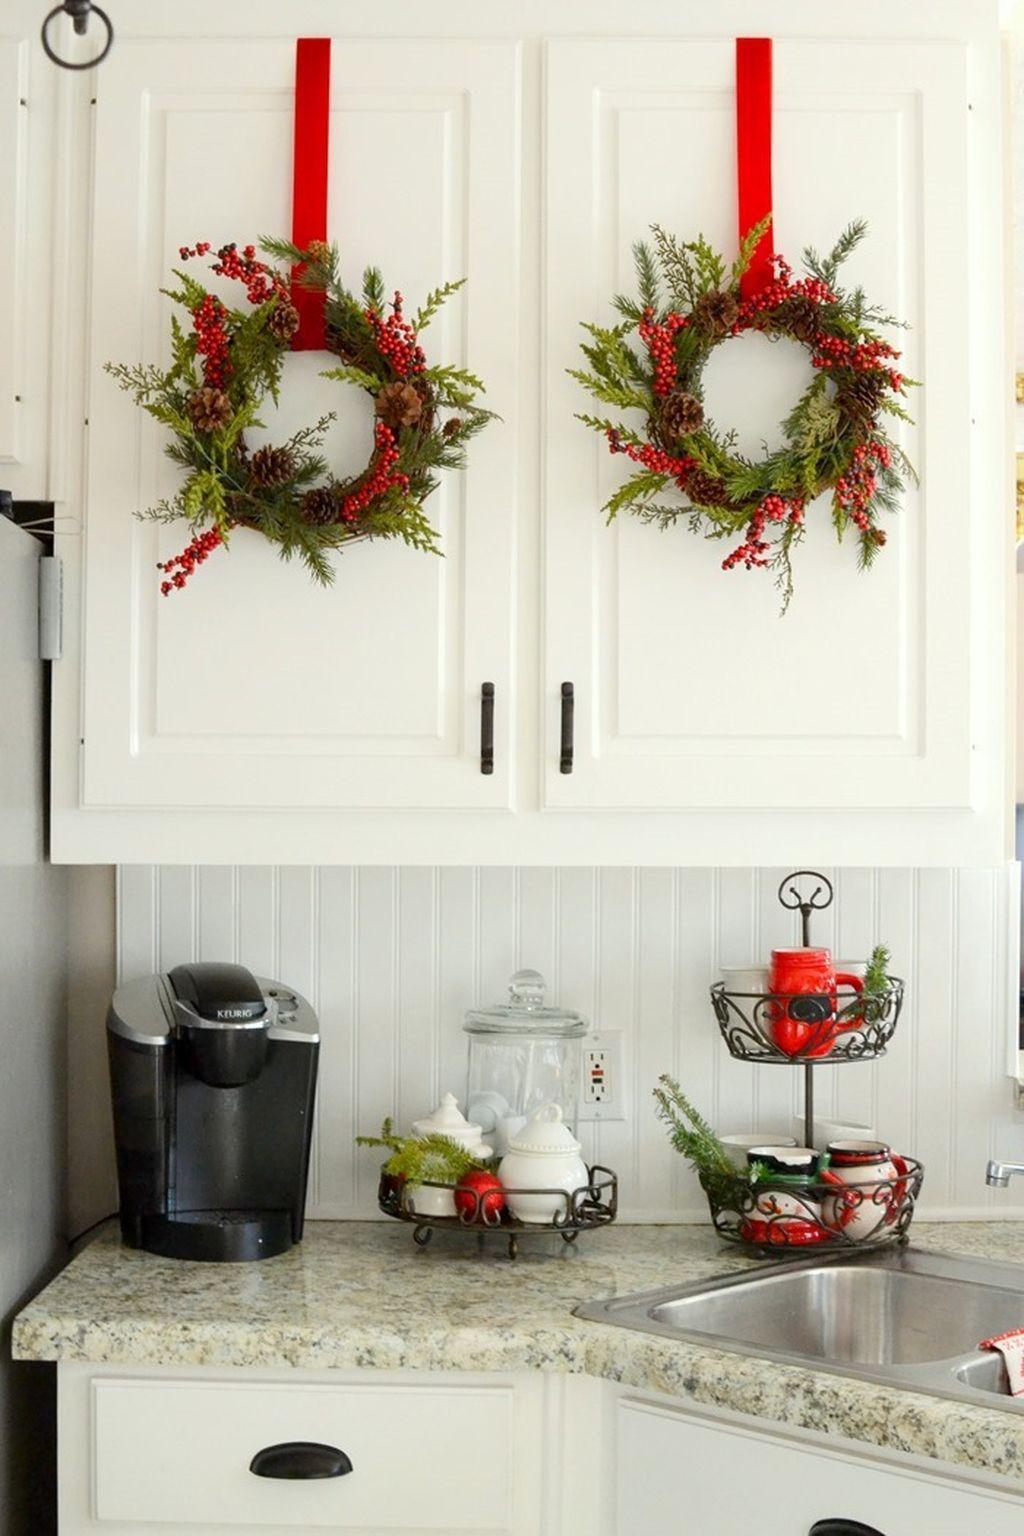 90 adorable rustic christmas kitchen decoration ideas homedecorish christmas kitchen decor on kitchen xmas decor id=68193